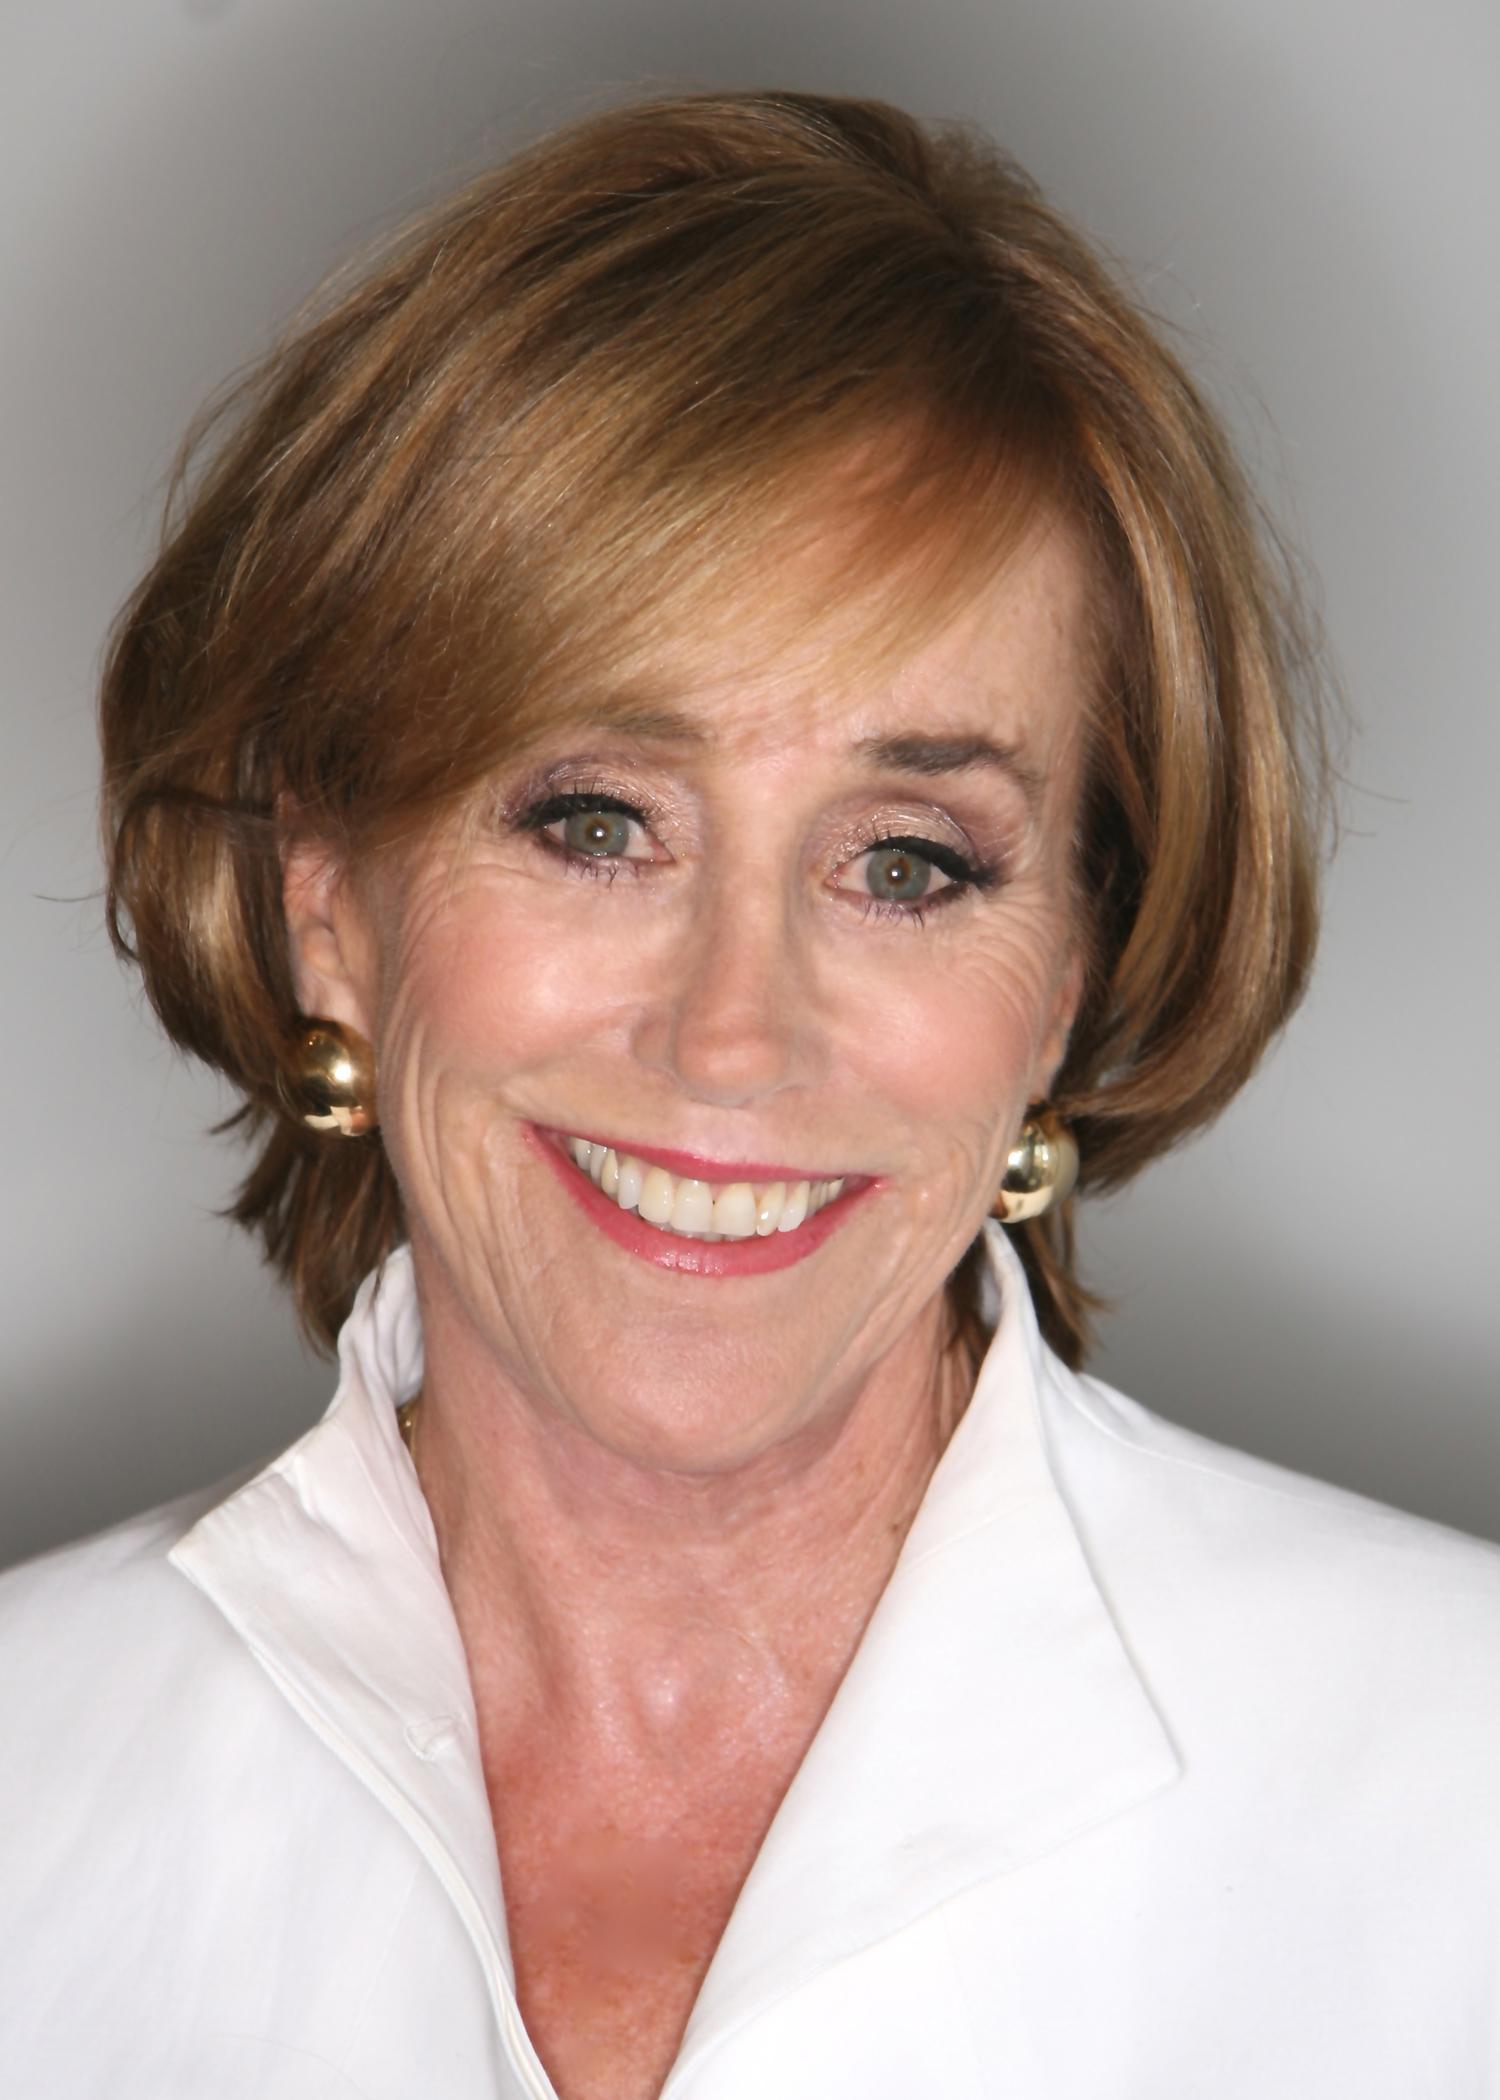 A portrait of Valerie Biden